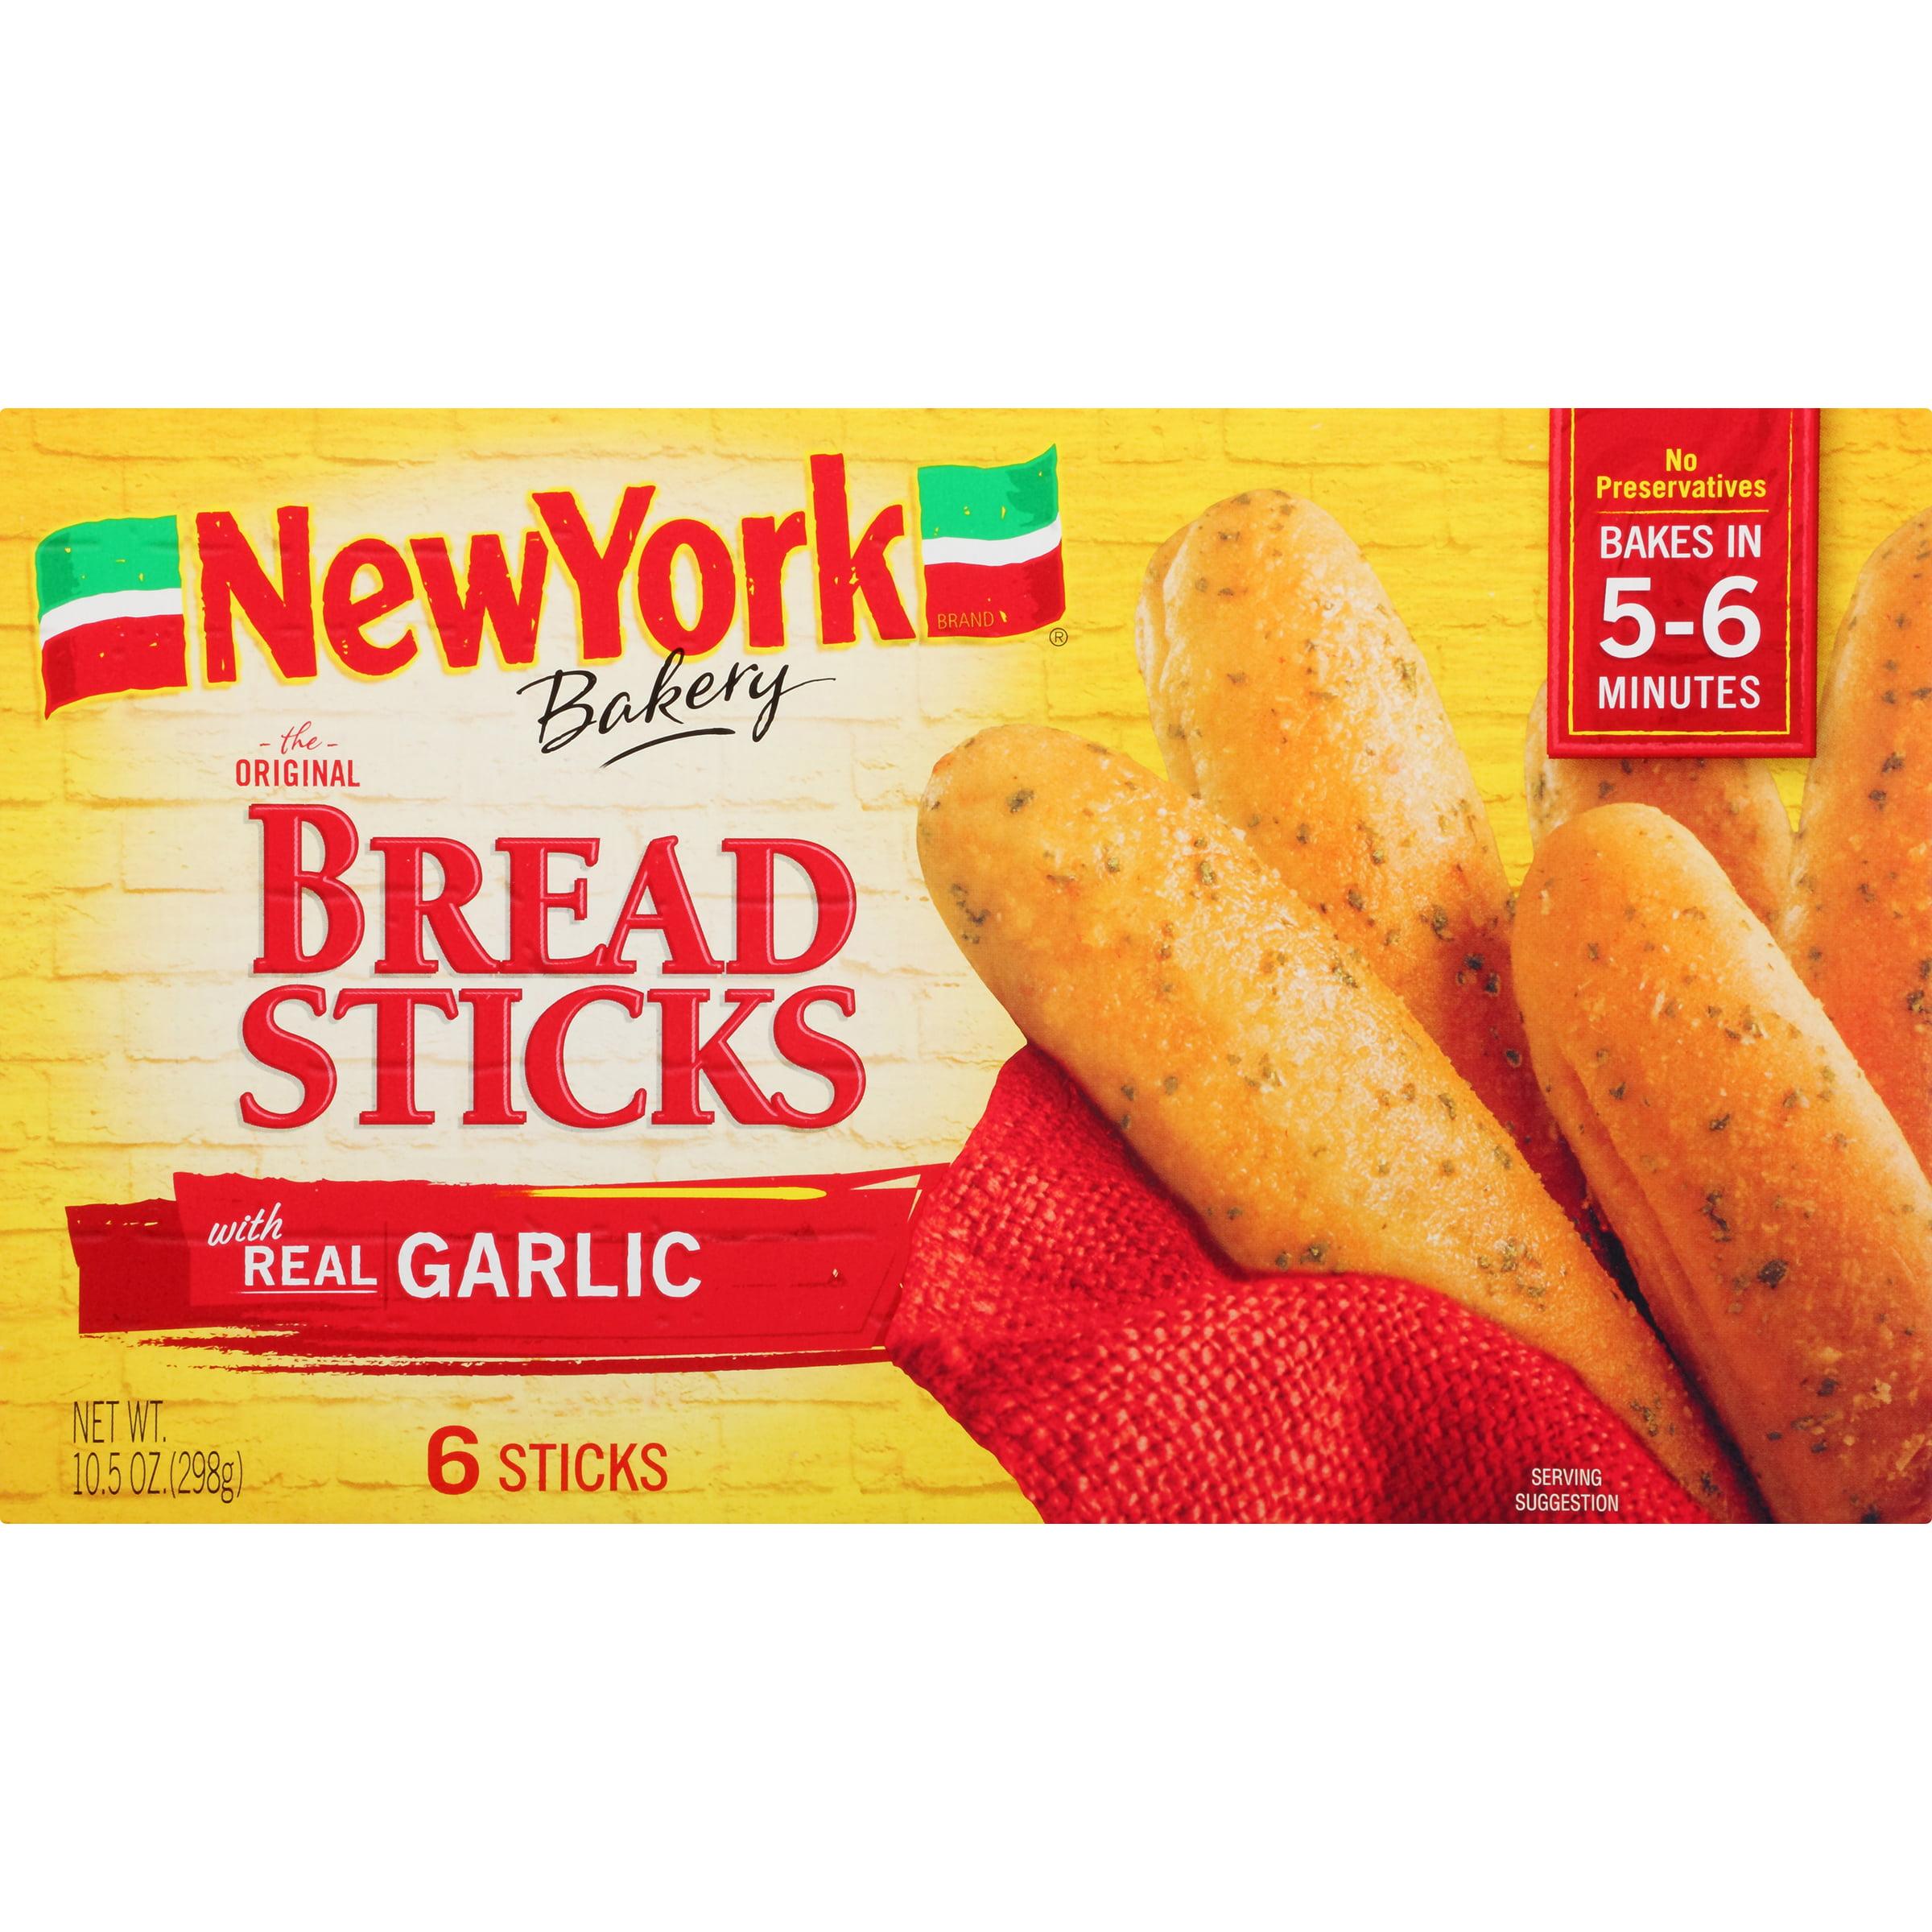 New York Bakery Original Bread Sticks with Real Garlic, 6 sticks